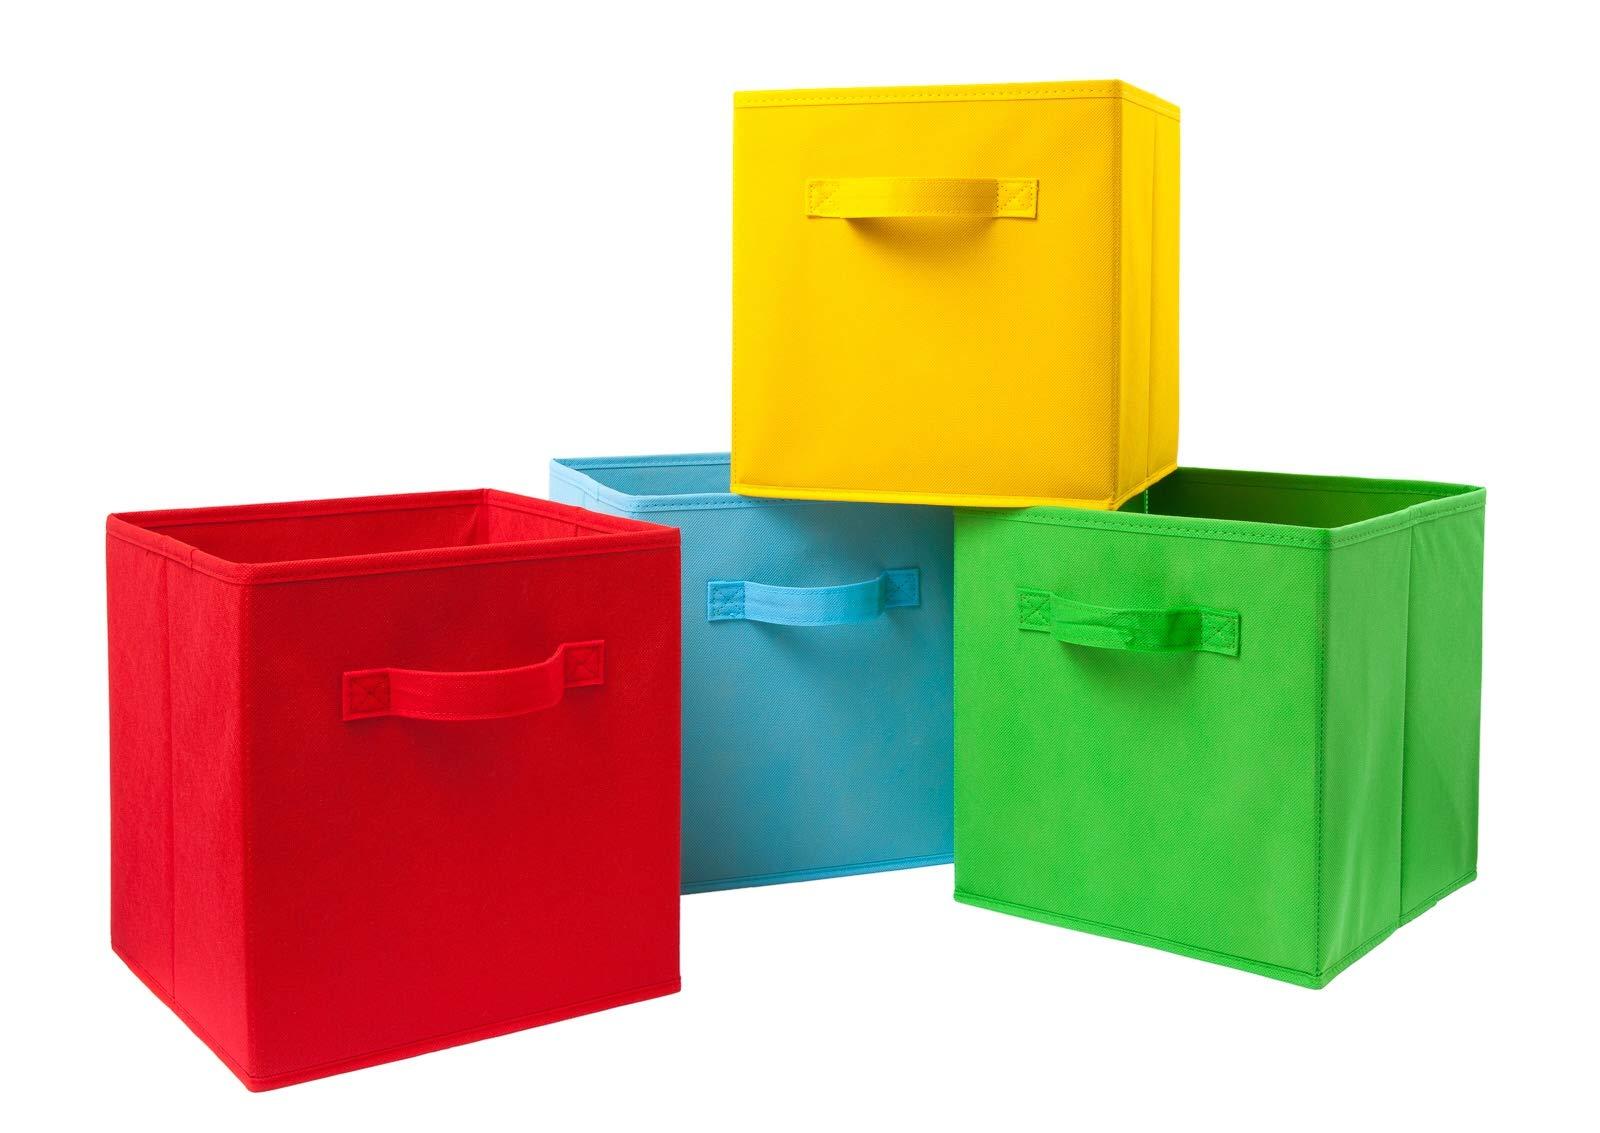 Full Size of Aufbewahrungsboxen Kinderzimmer Mit Deckel Amazon Ikea Mint Stapelbar Design Plastik Homelife 4 Stck Faltbare Aufbewahrungsboorganizer Cube Korb Box Regal Kinderzimmer Aufbewahrungsboxen Kinderzimmer